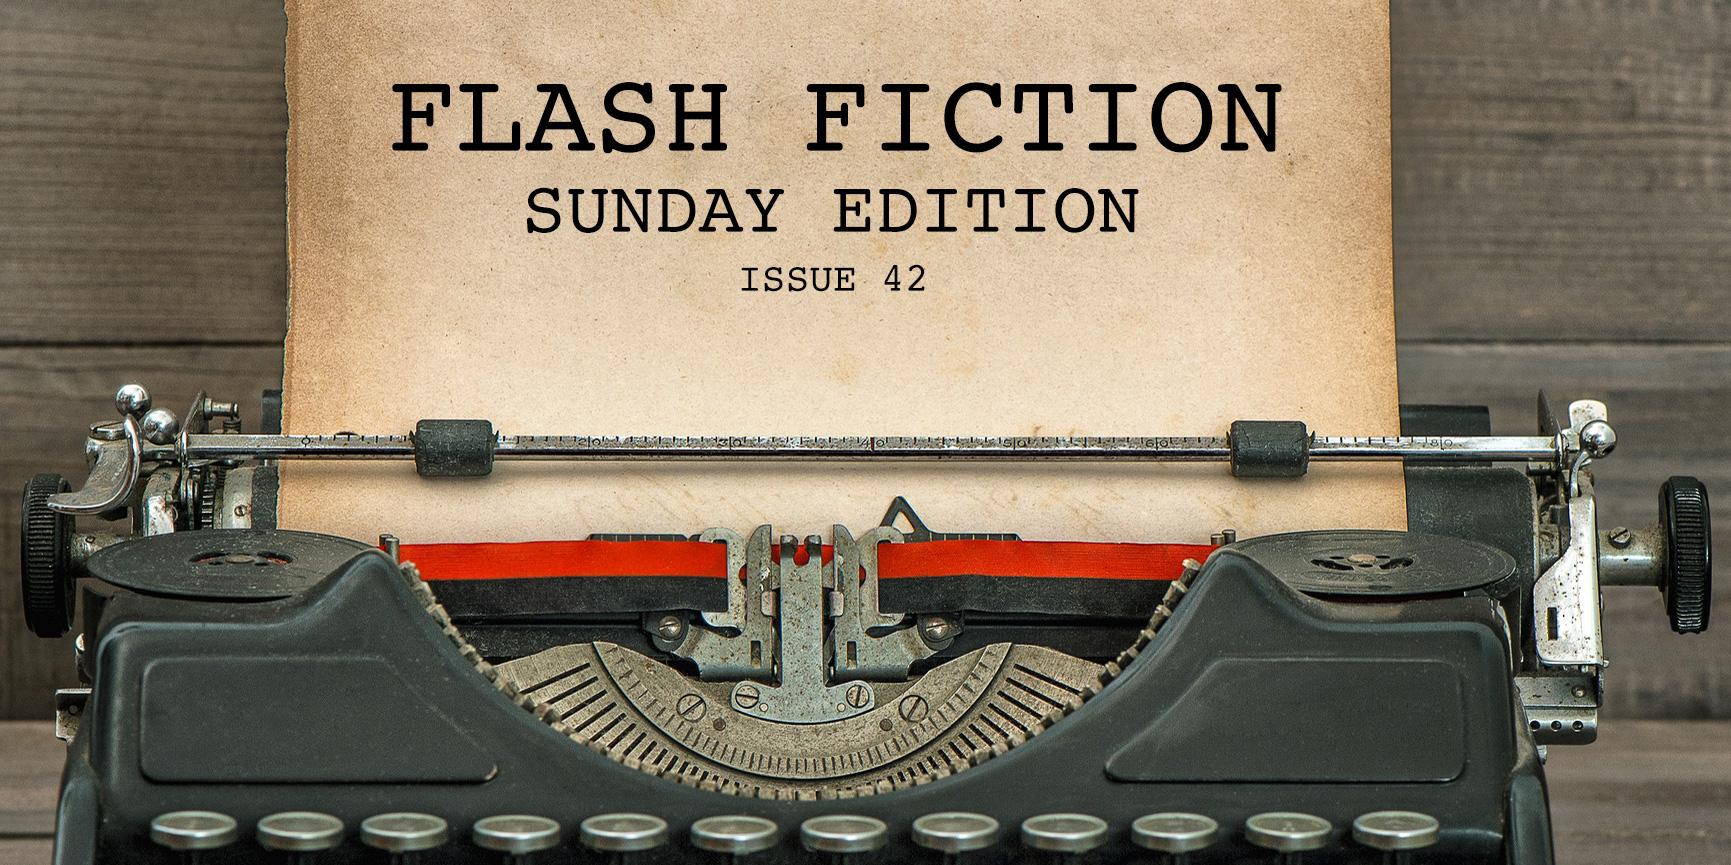 Flash Fiction Sunday Edition - Issue 42